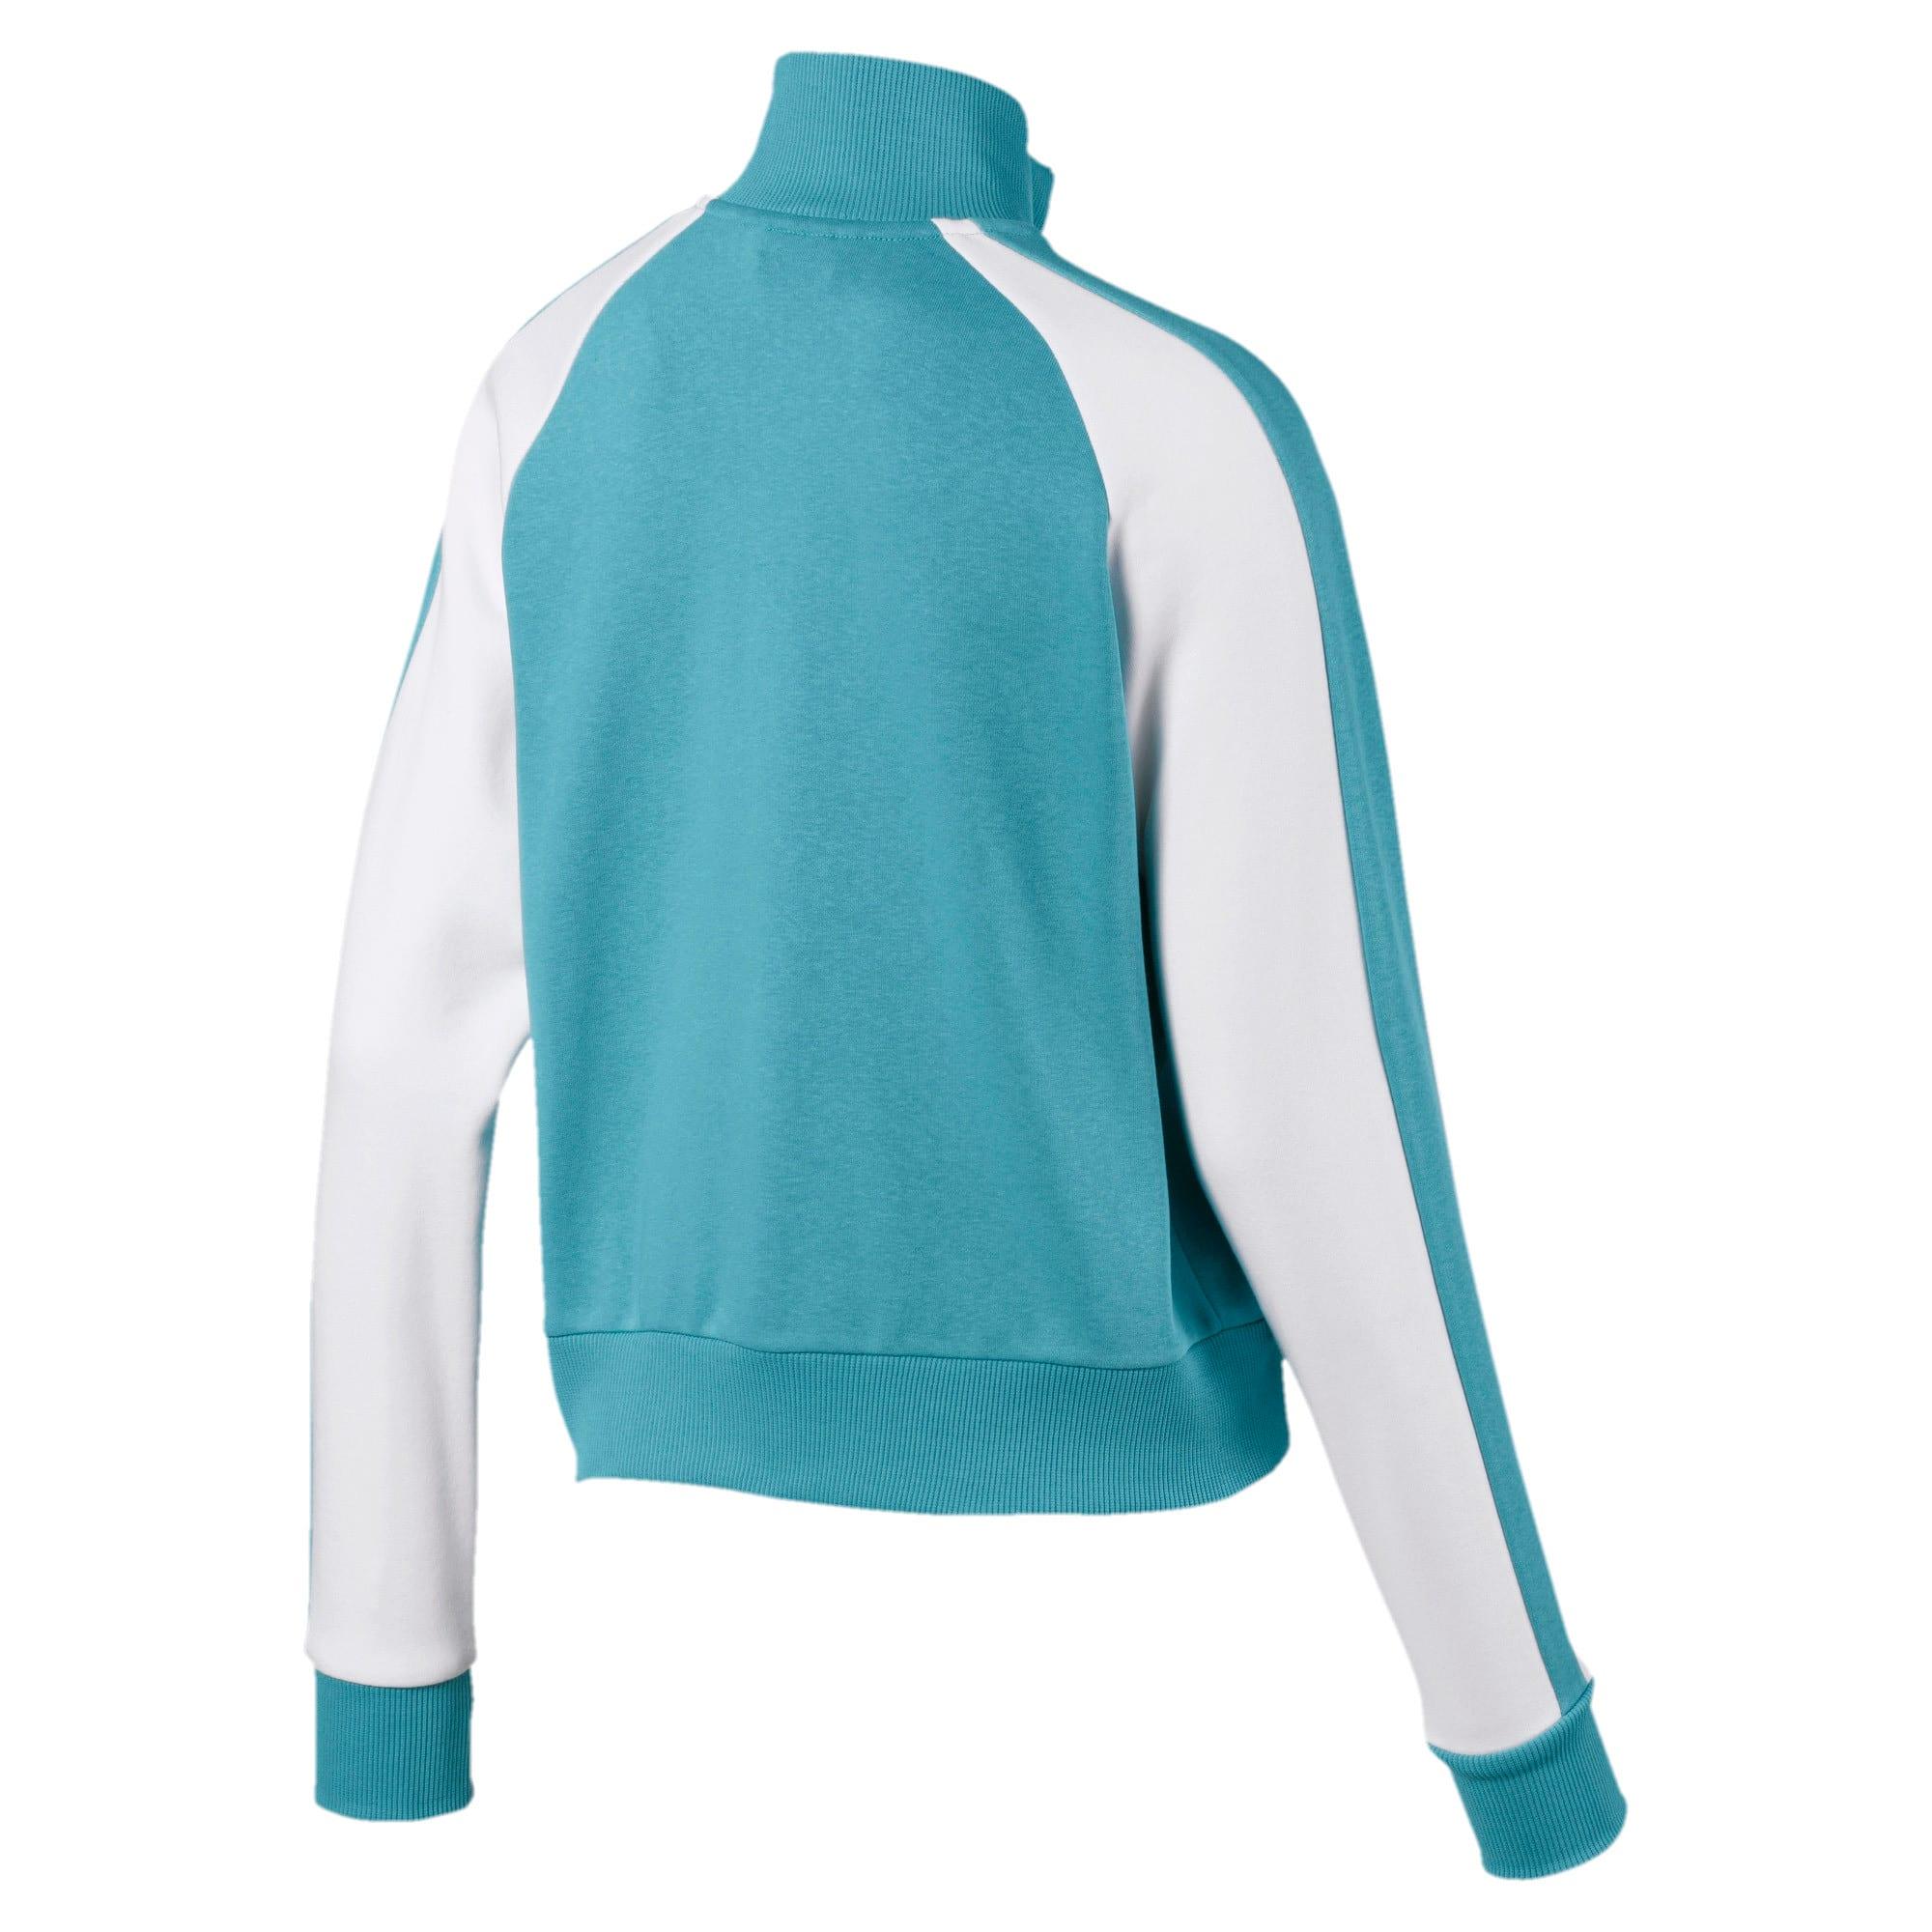 Miniatura 5 de Chaqueta deportiva Classics T7 para mujer, Milky Blue, mediano